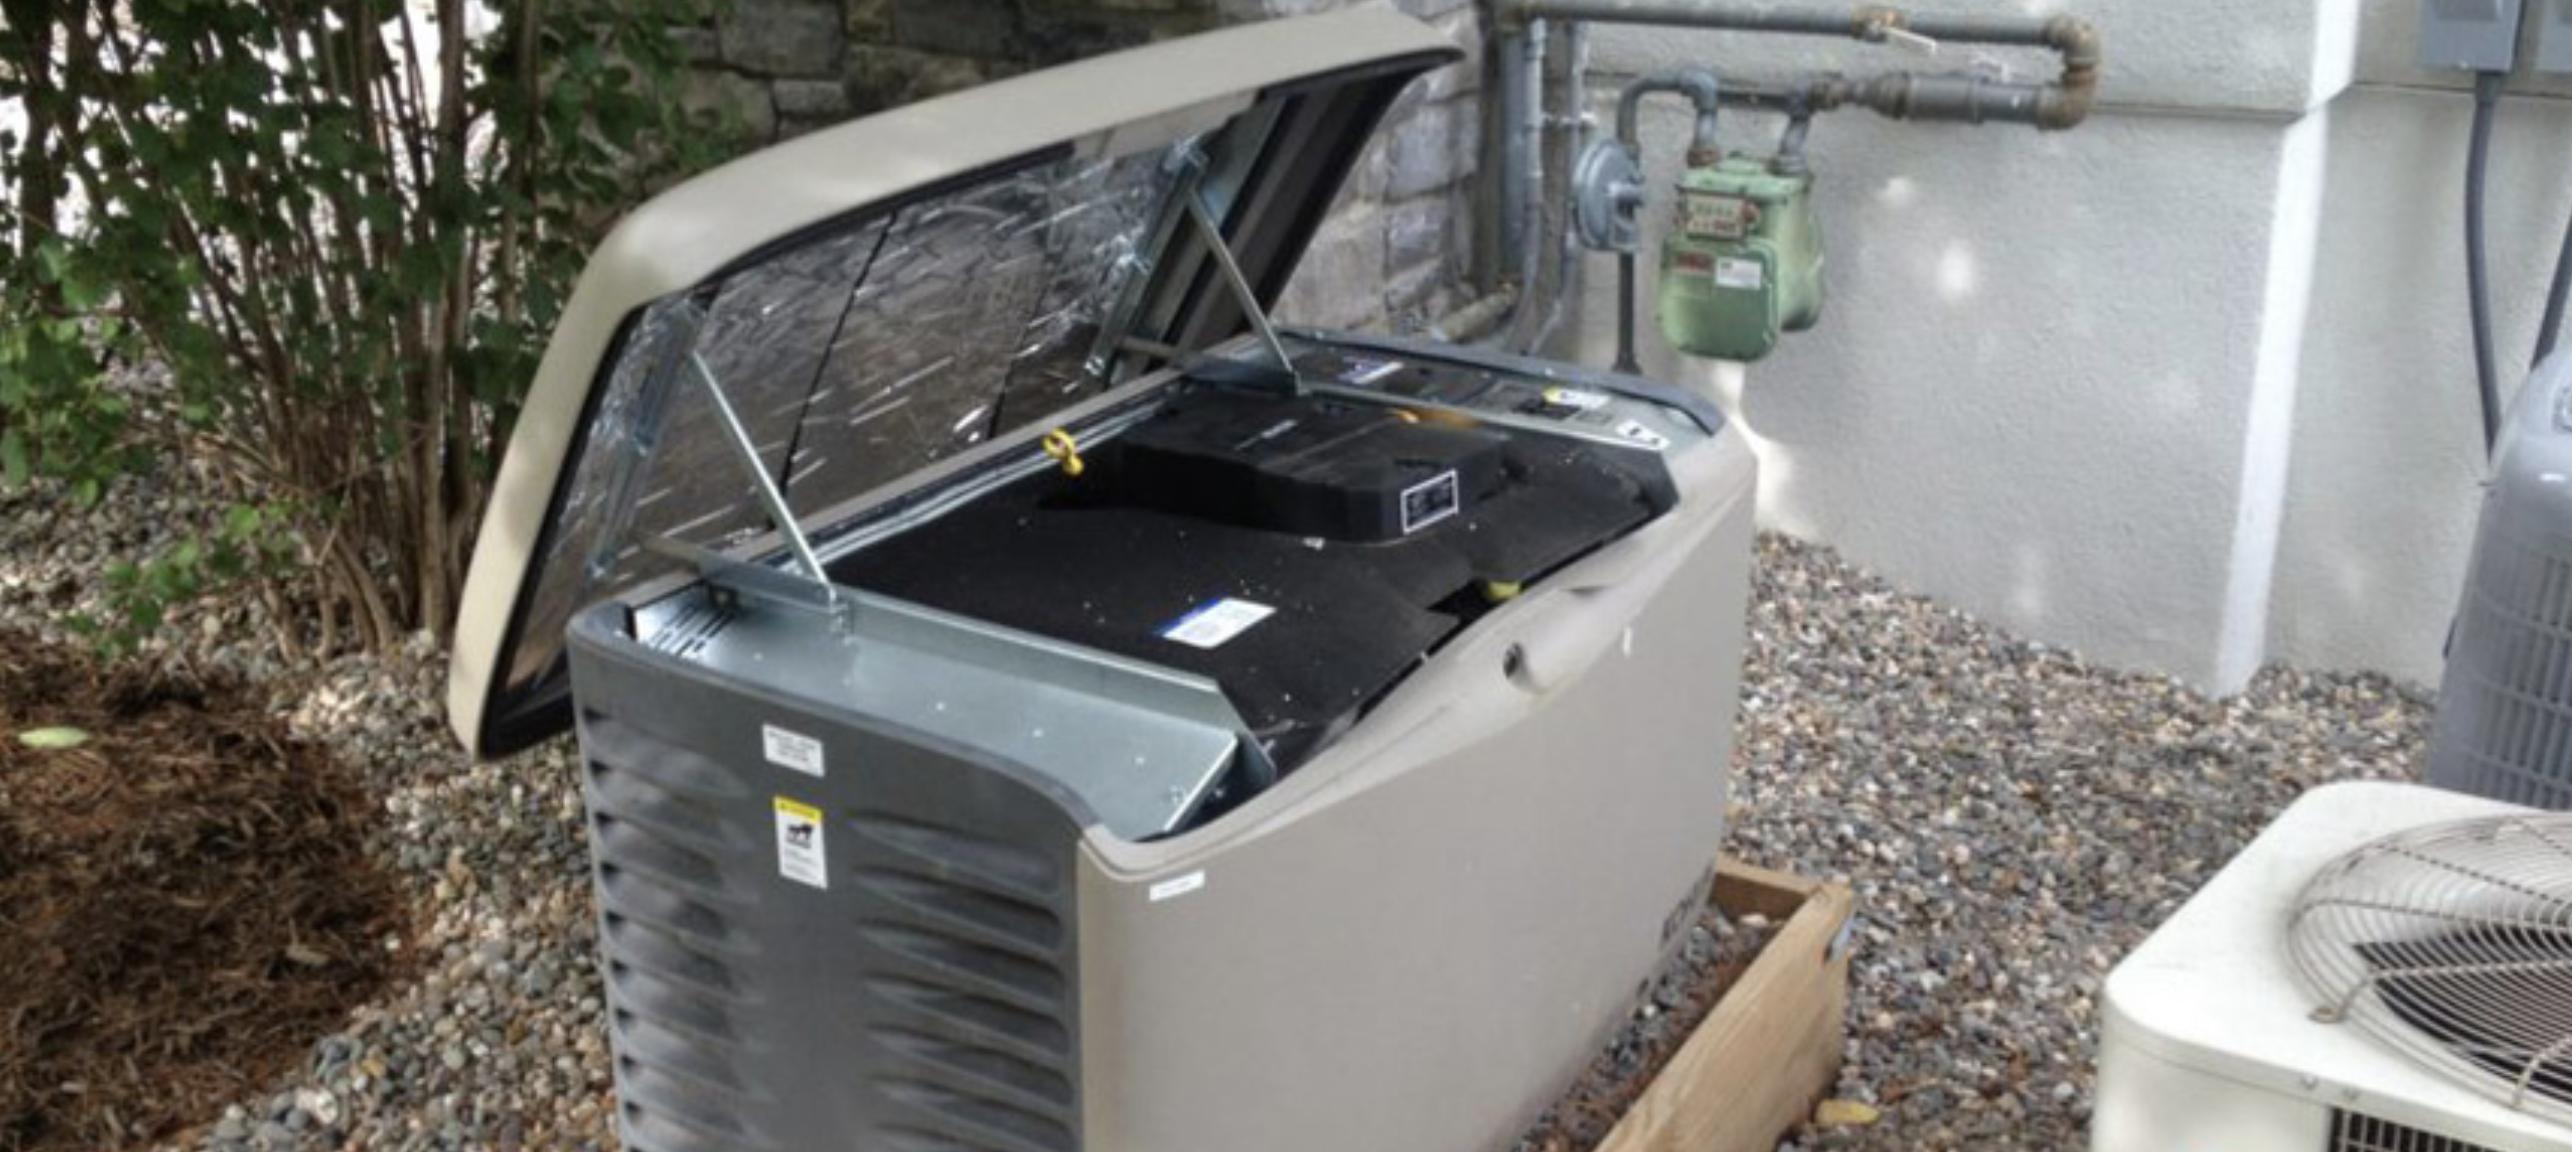 Westfield Generators | Generators in Westfield